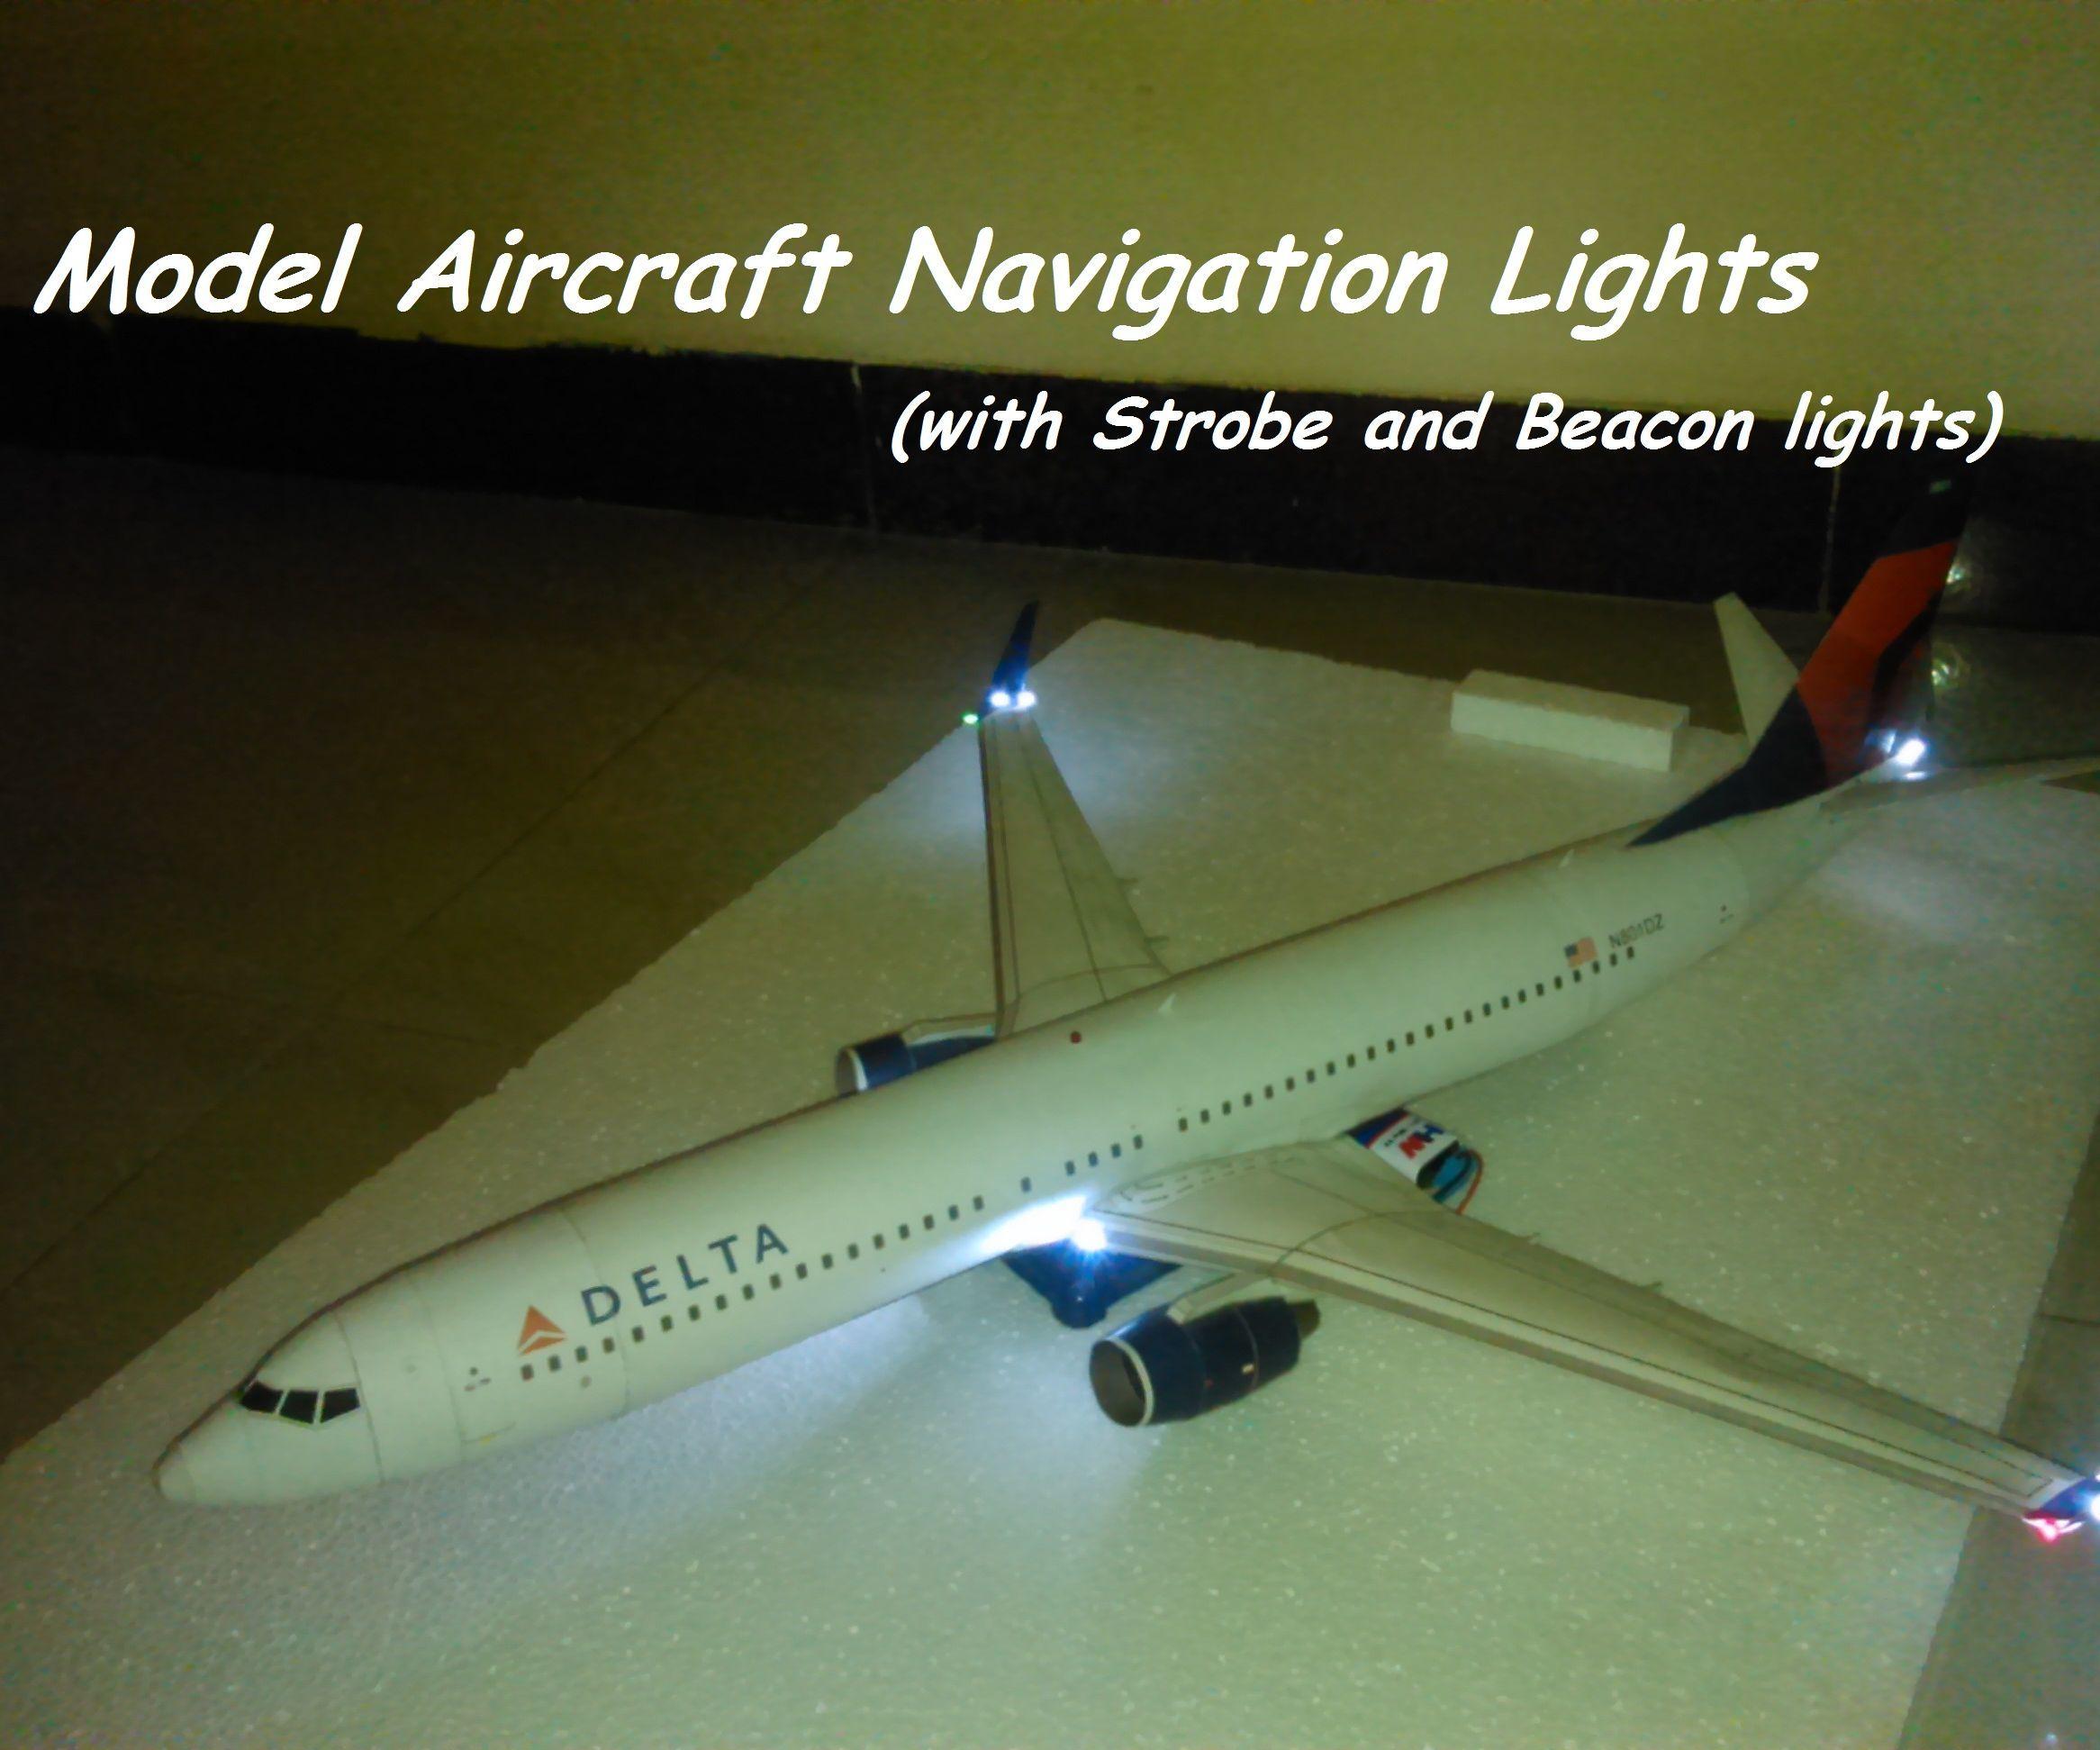 $1 Model Aircraft Navigation Lights